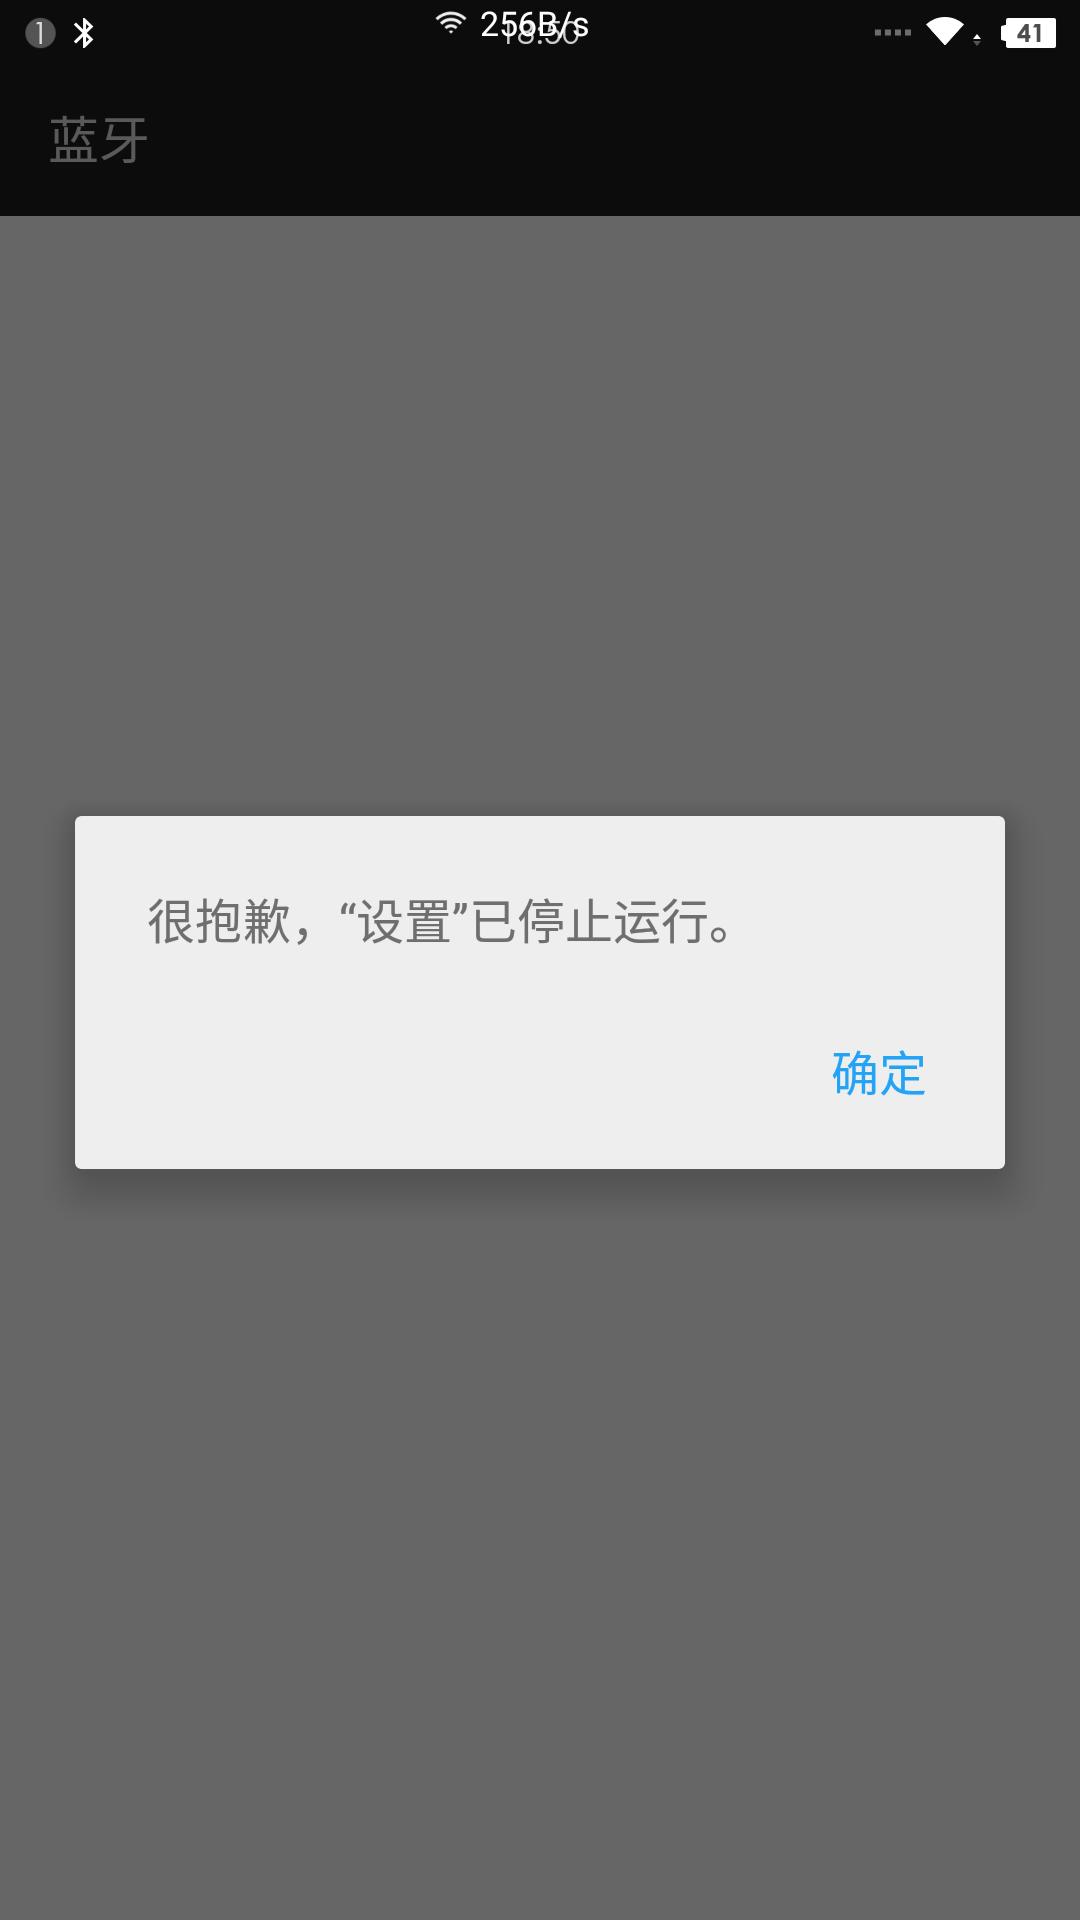 Screenshot_2015-09-17-18-50-53.png